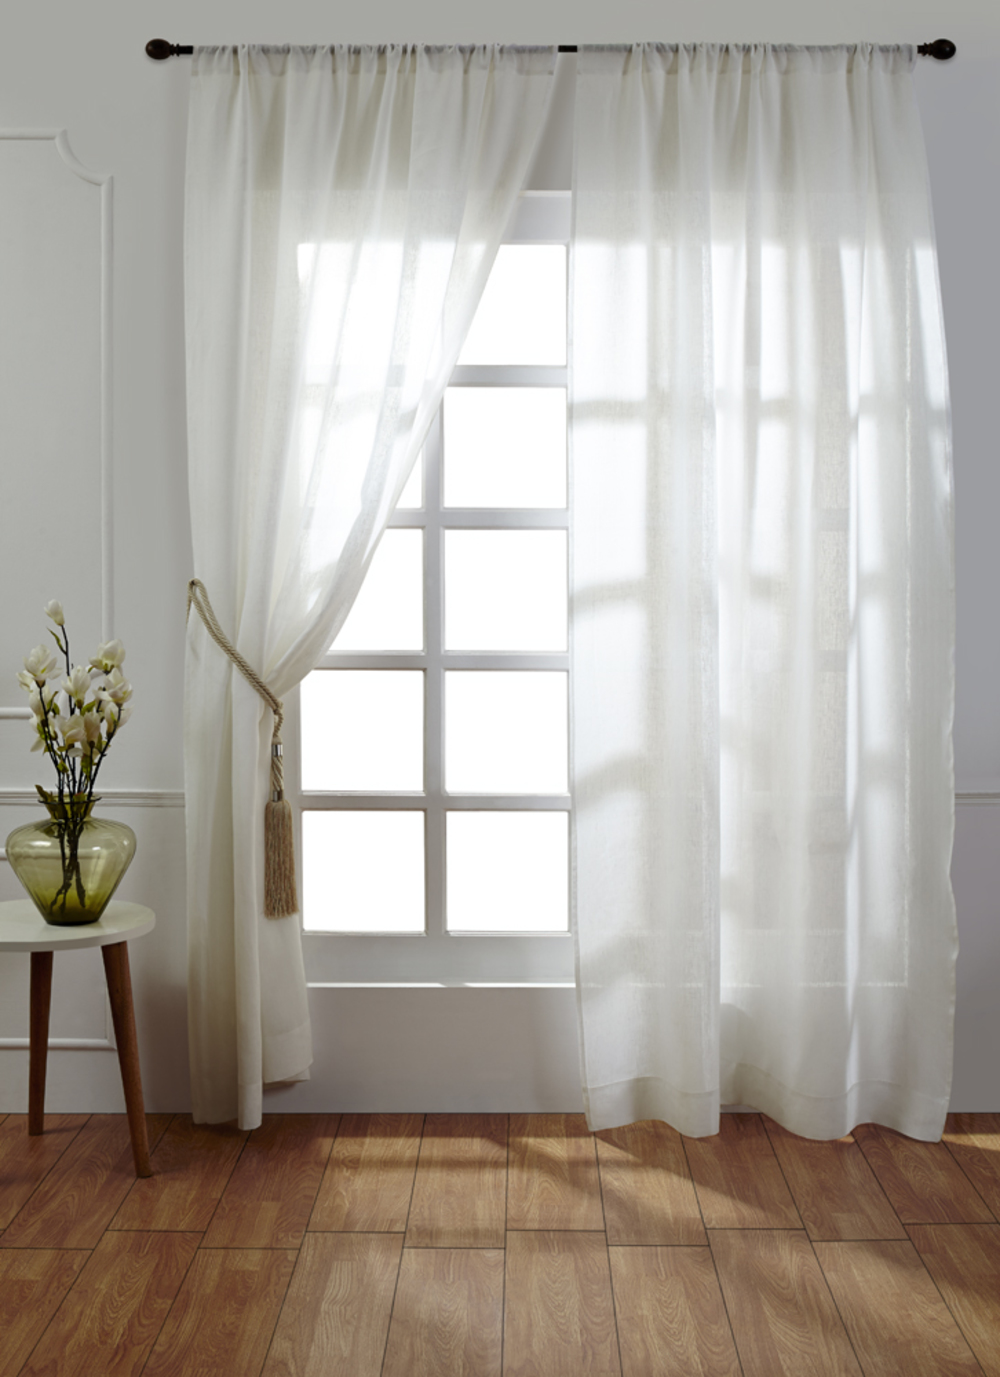 Amity Imports - Damara White Linen Curtains